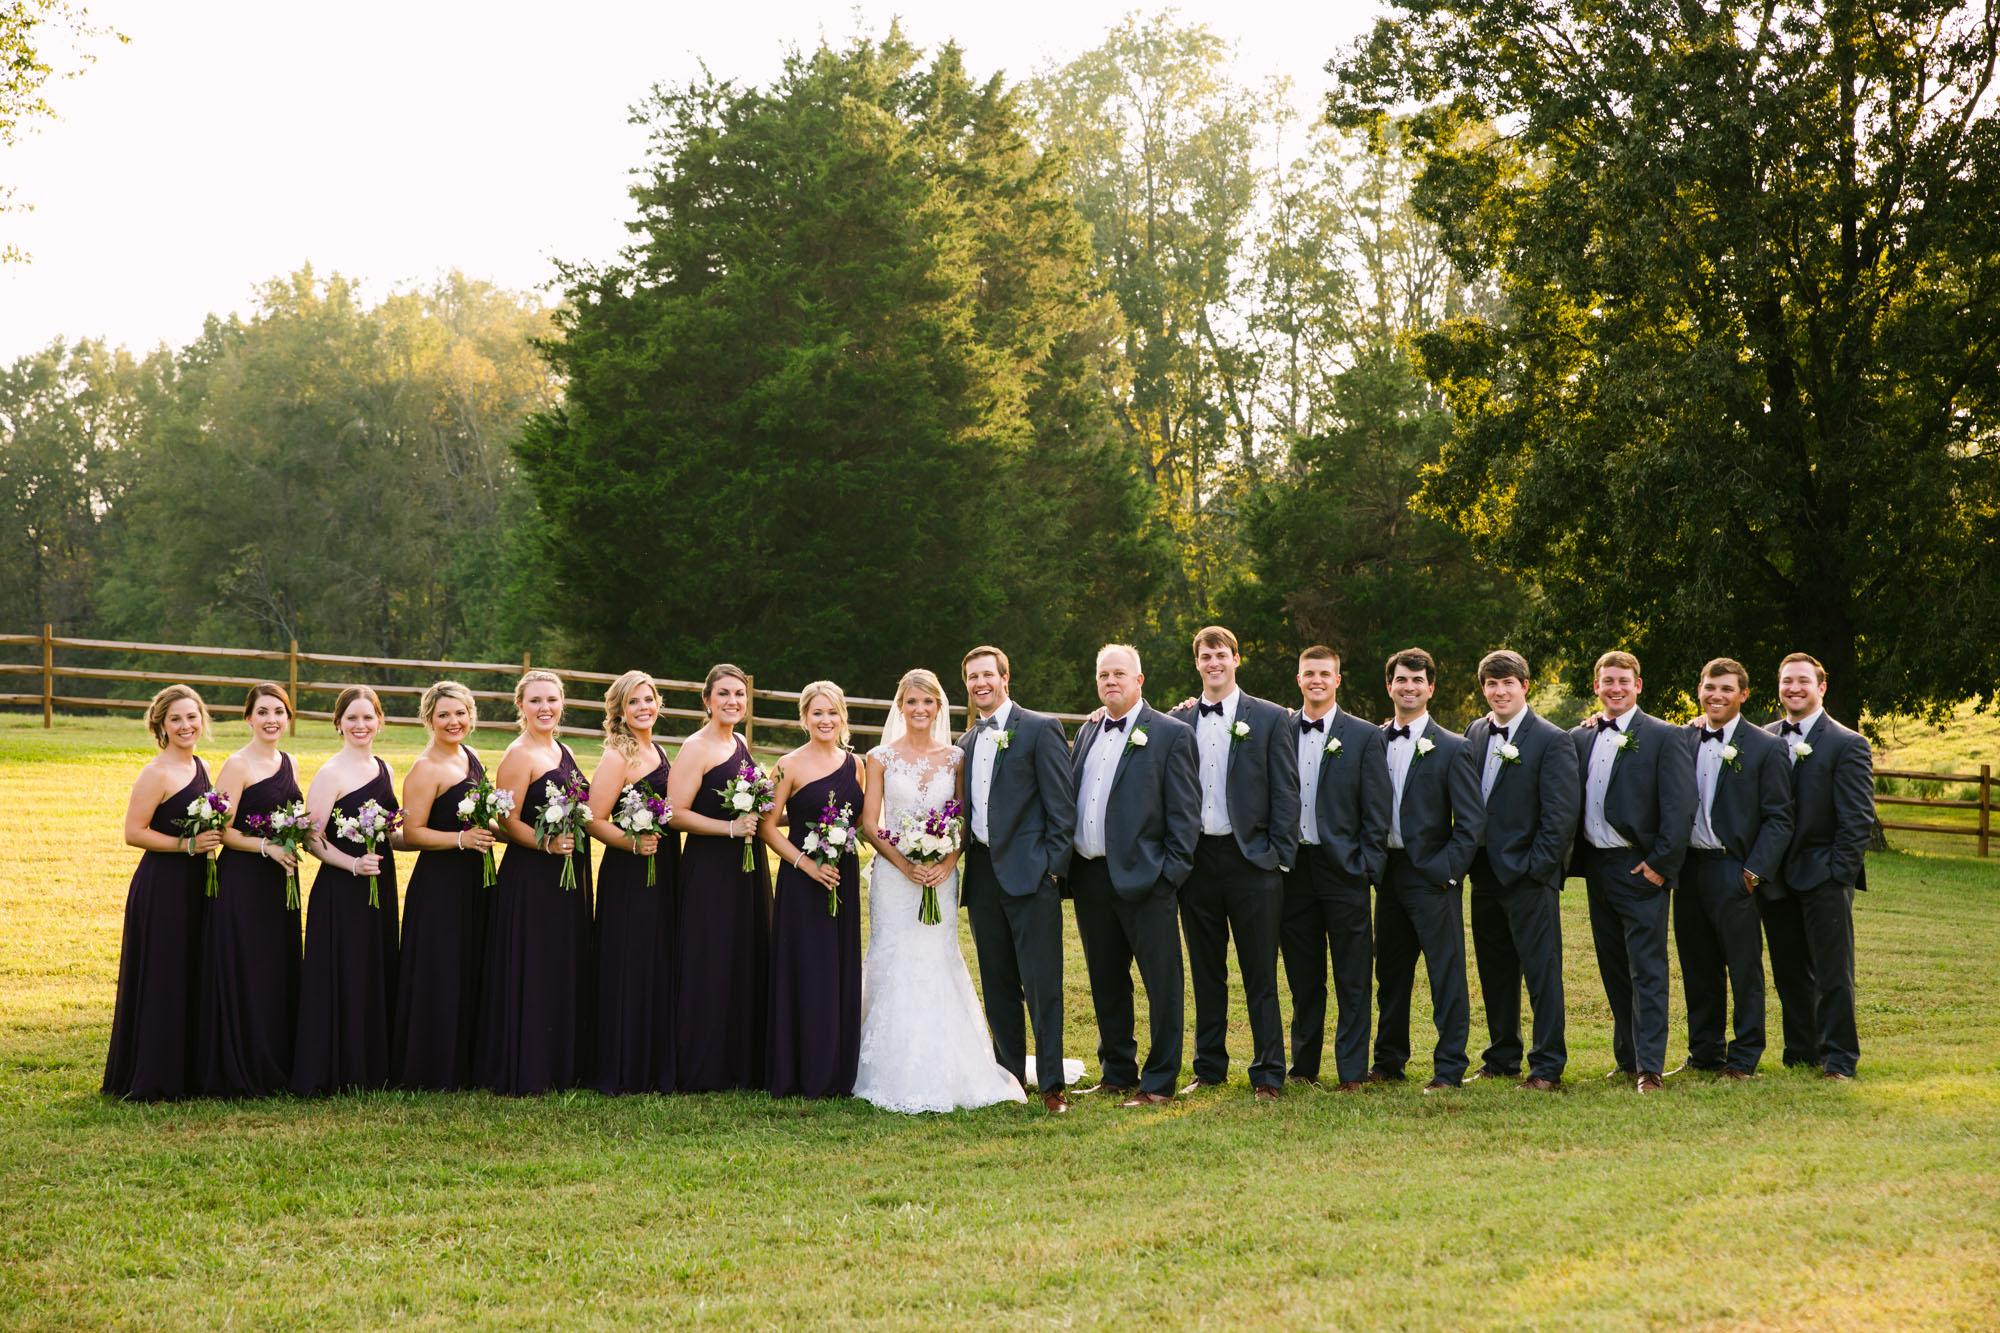 Waynesville, NC Wedding Photography | Full Bridal Party Portrait